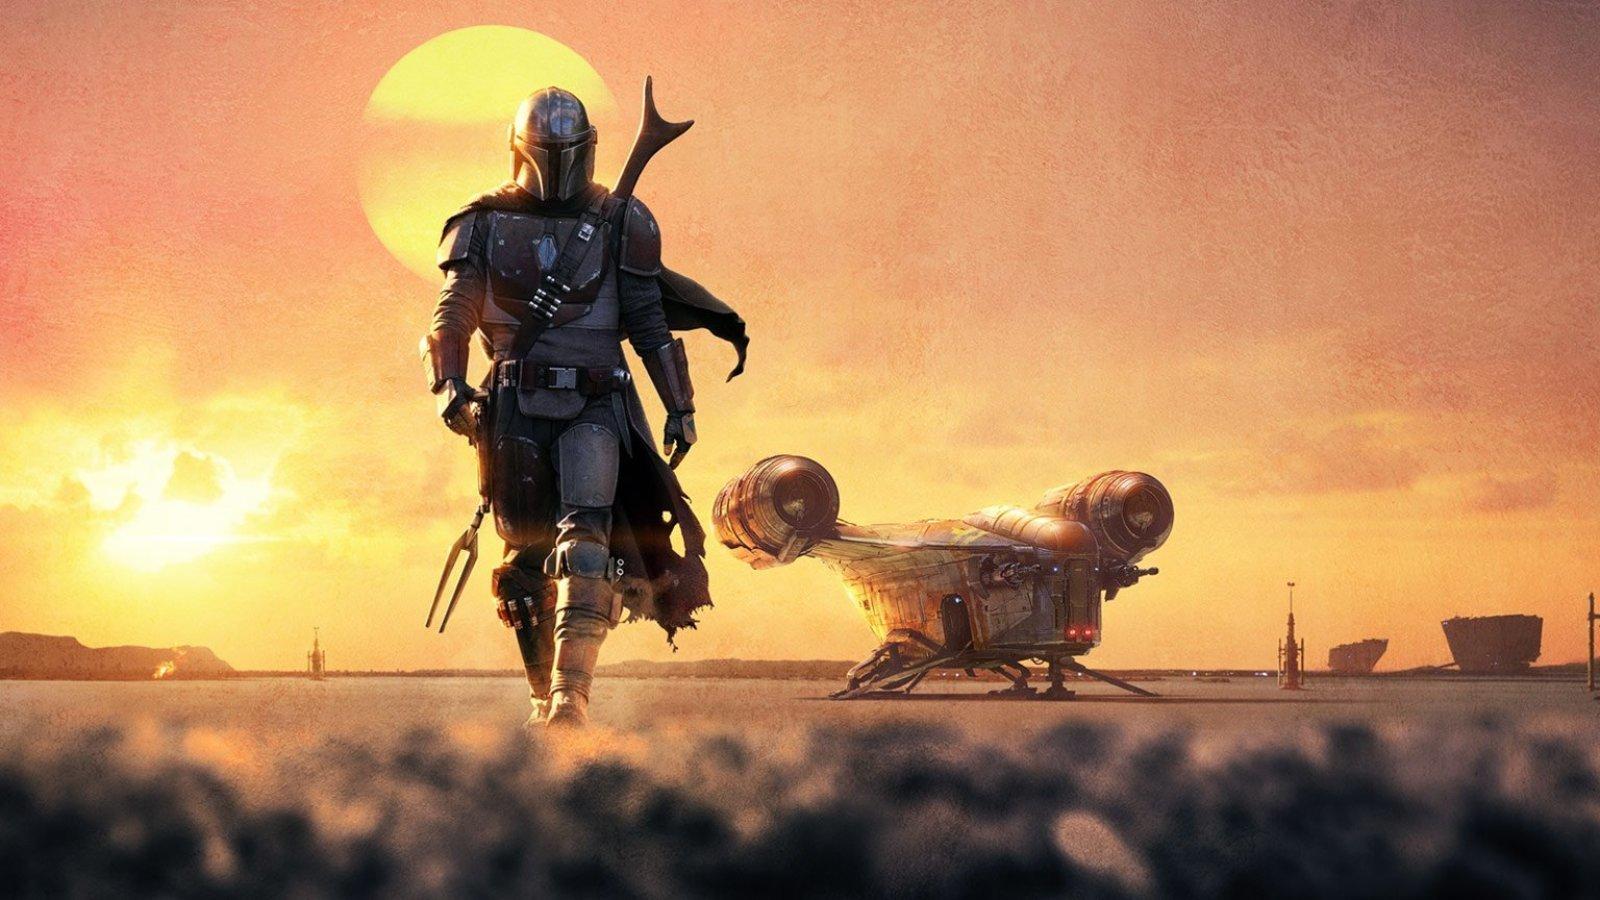 La anticipada serie Star Wars, The Mandalorian, debuta segundo tráiler